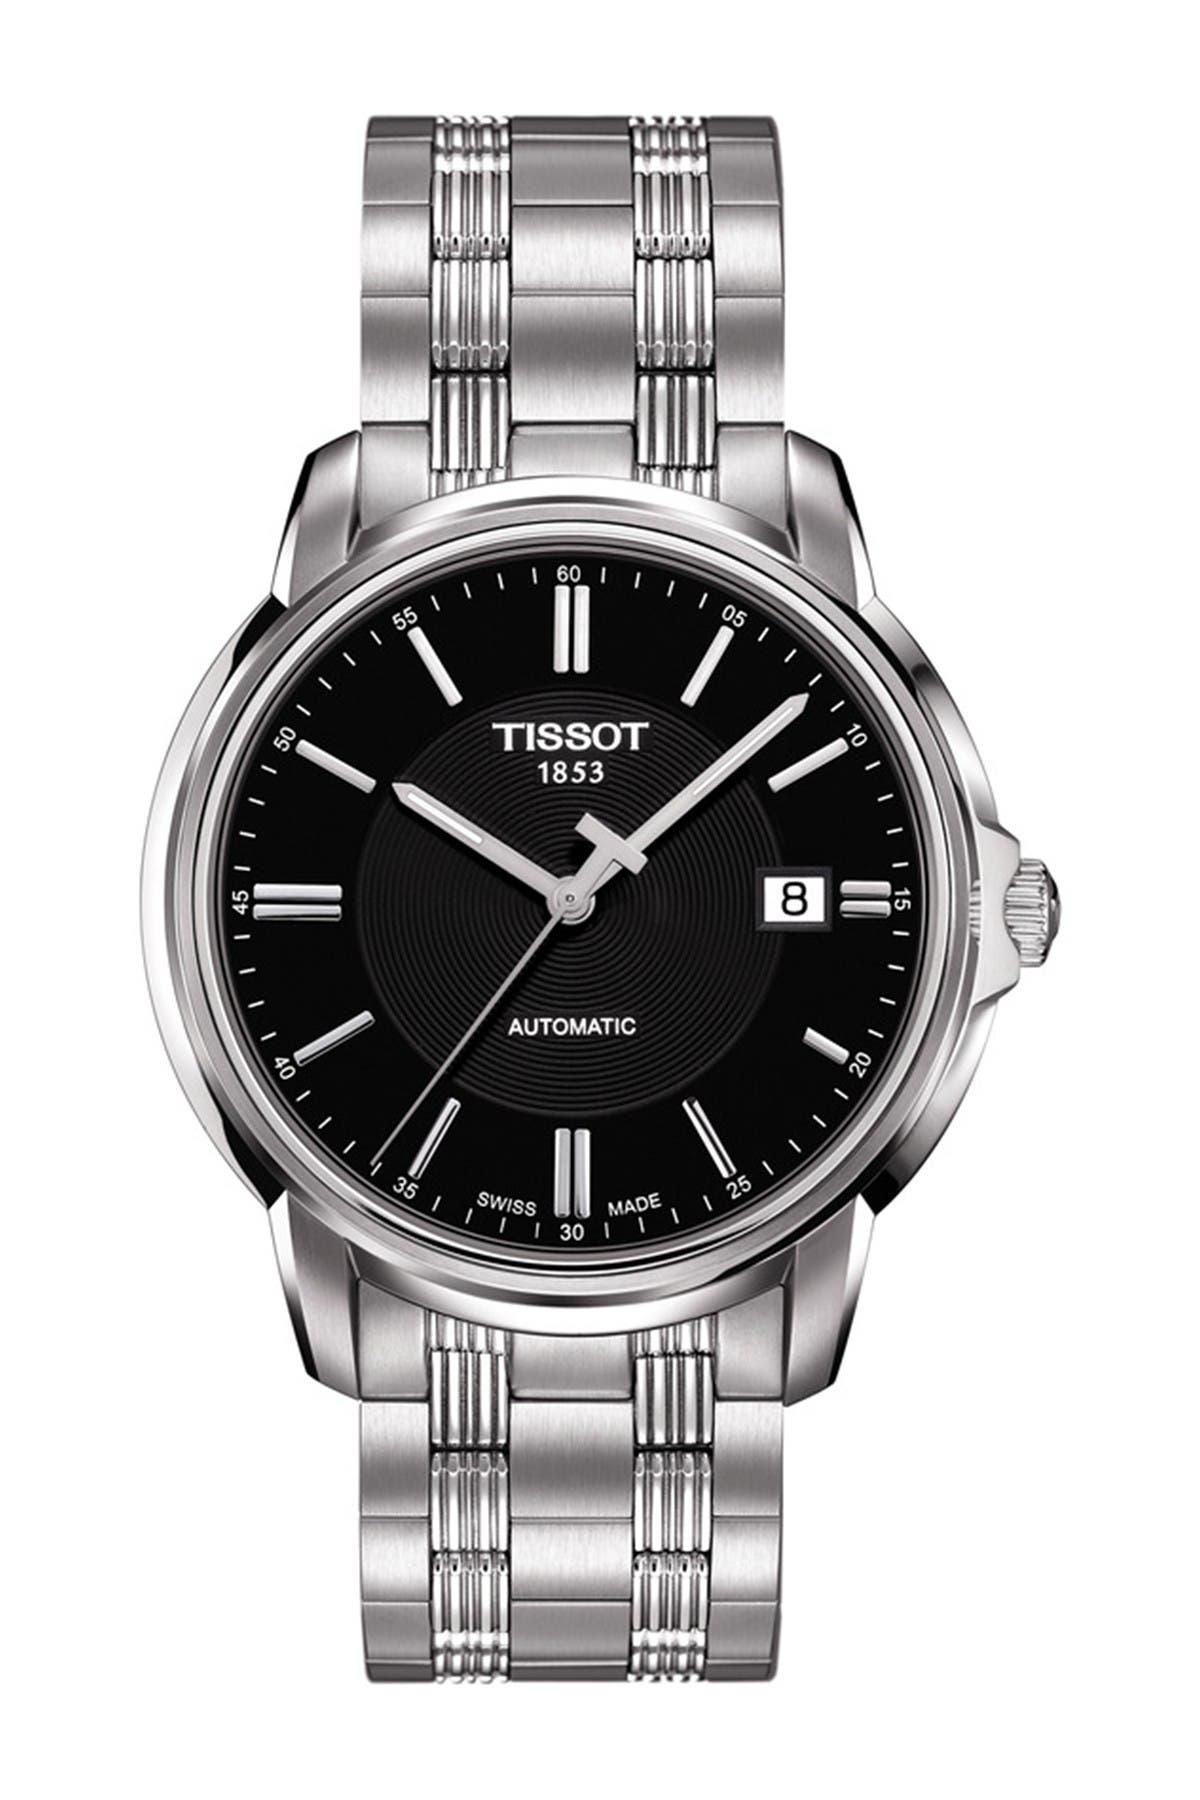 Image of Tissot Men's Automatic III Bracelet Watch, 39mm